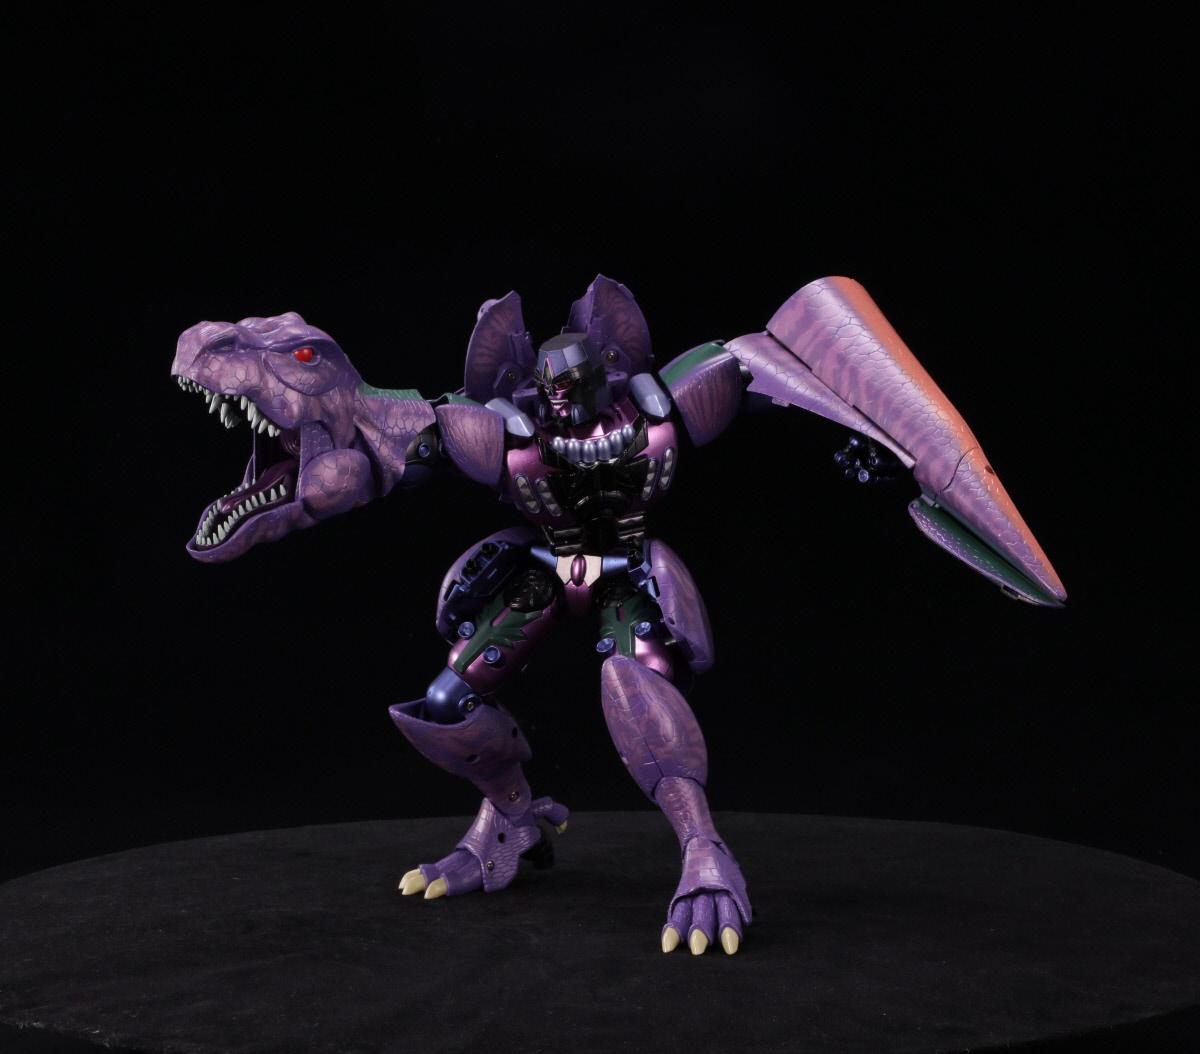 Transformer World 2005 - Transformers News - Page 193 of 3615